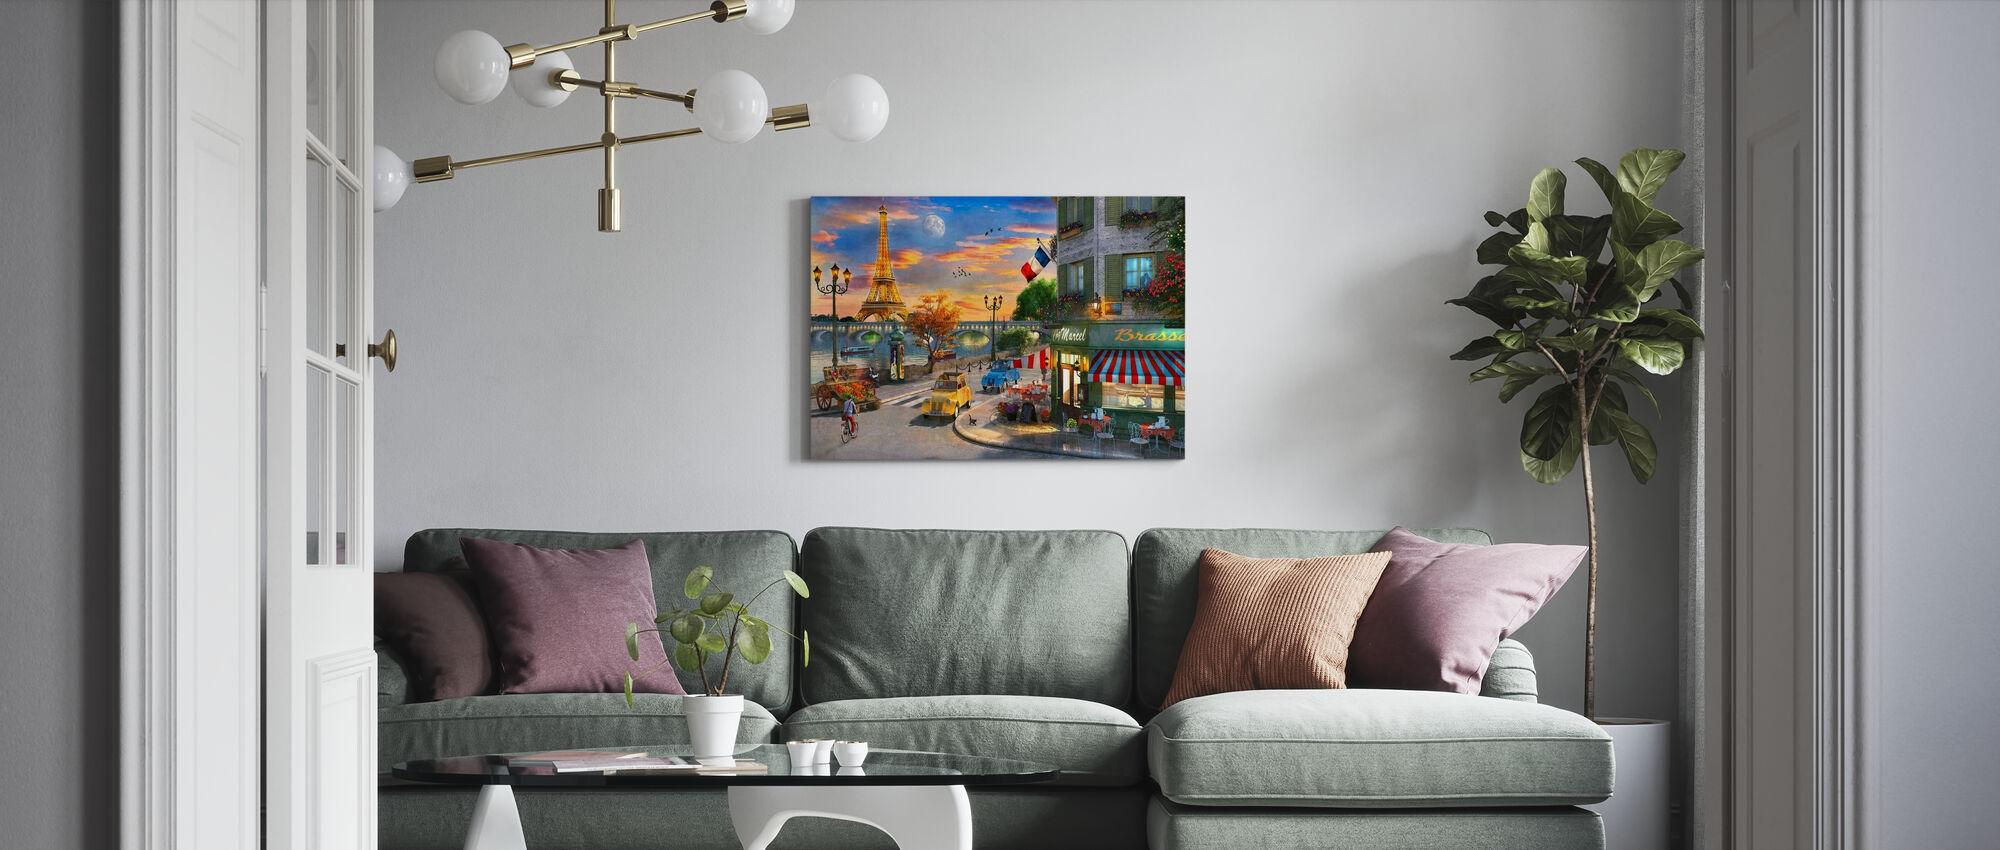 Paris Street Cafe - Canvas print - Living Room